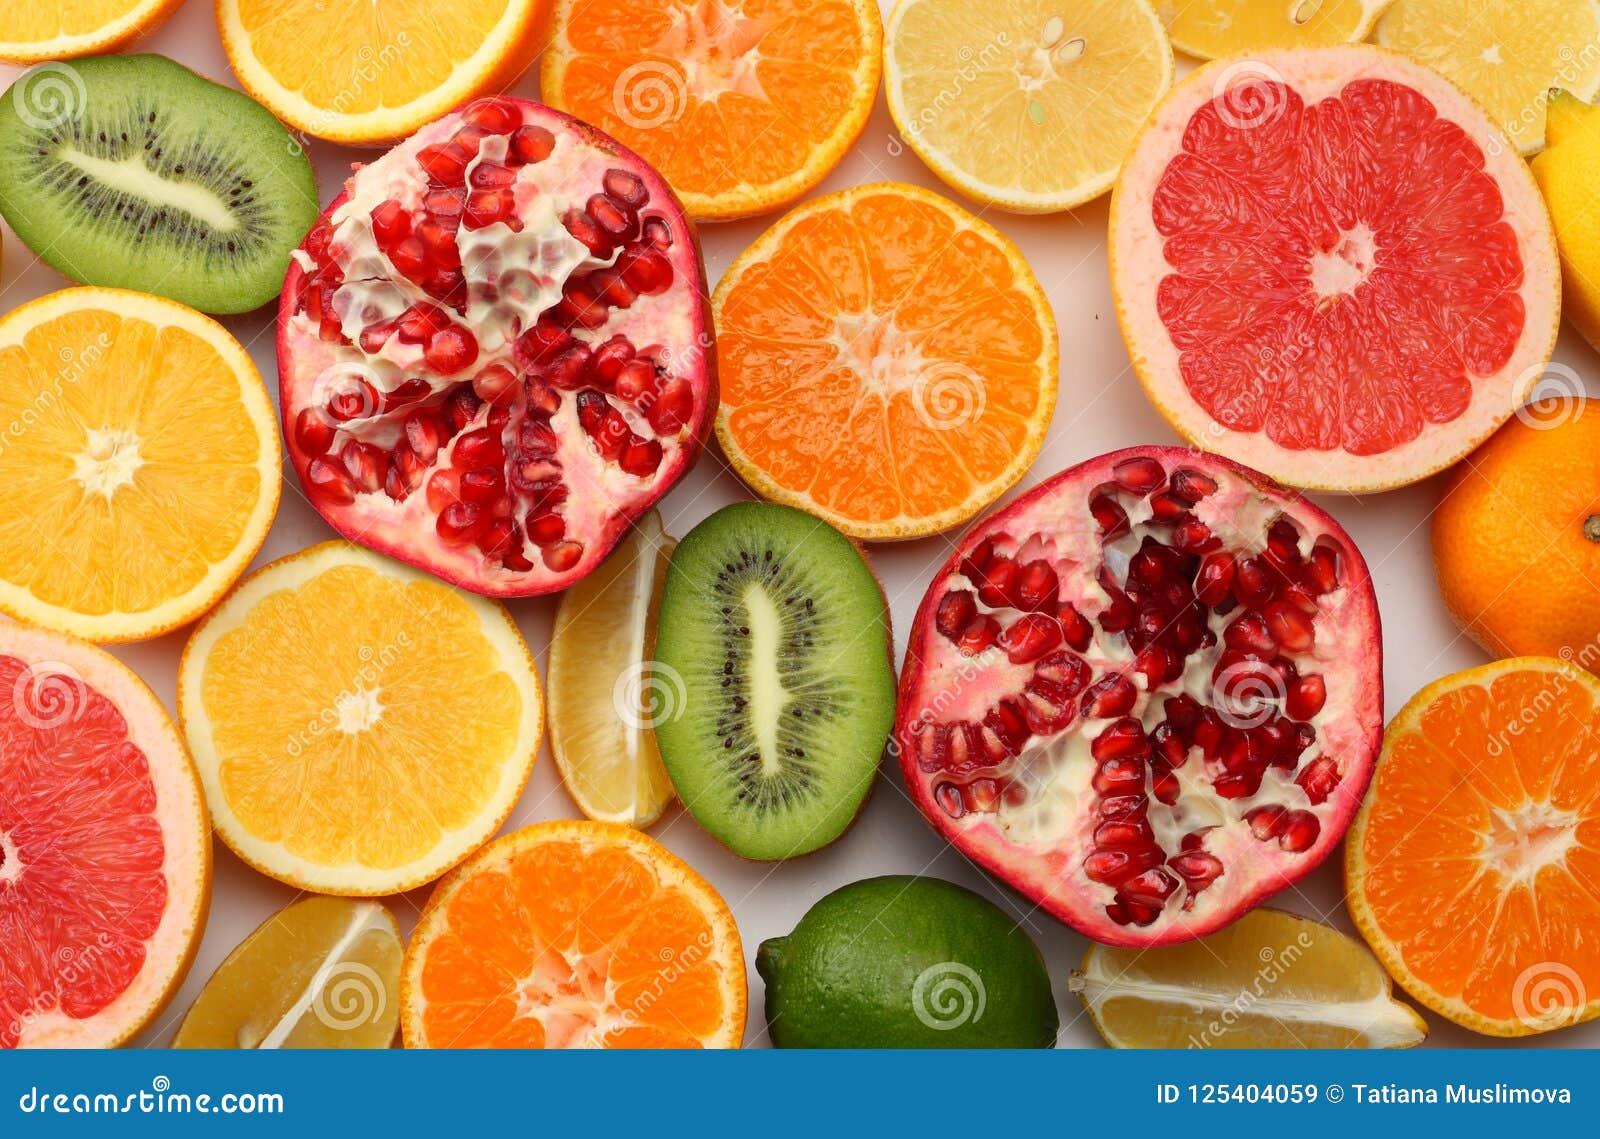 healthy food. mix sliced lemon, green lime, orange, mandarin, kiwi fruit and grapefruit isolated on white background. top view